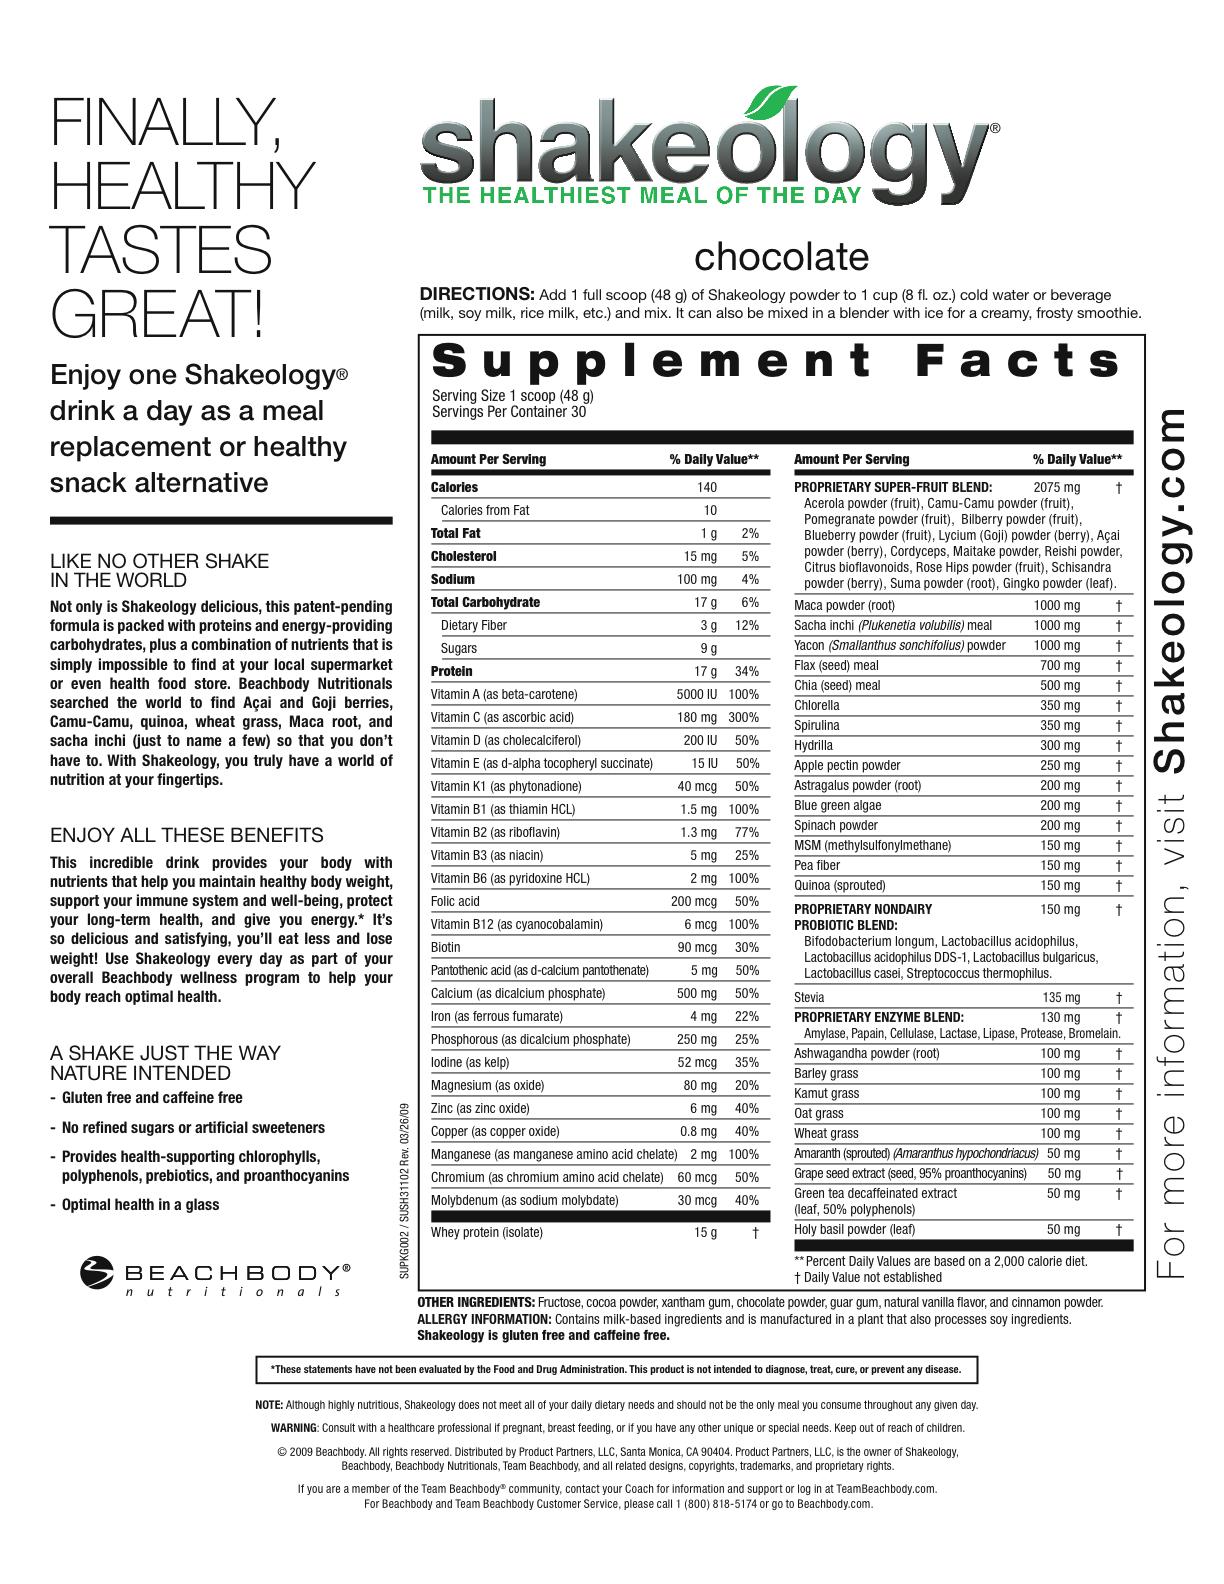 Shakeology Ingredients - Is It Worth It?